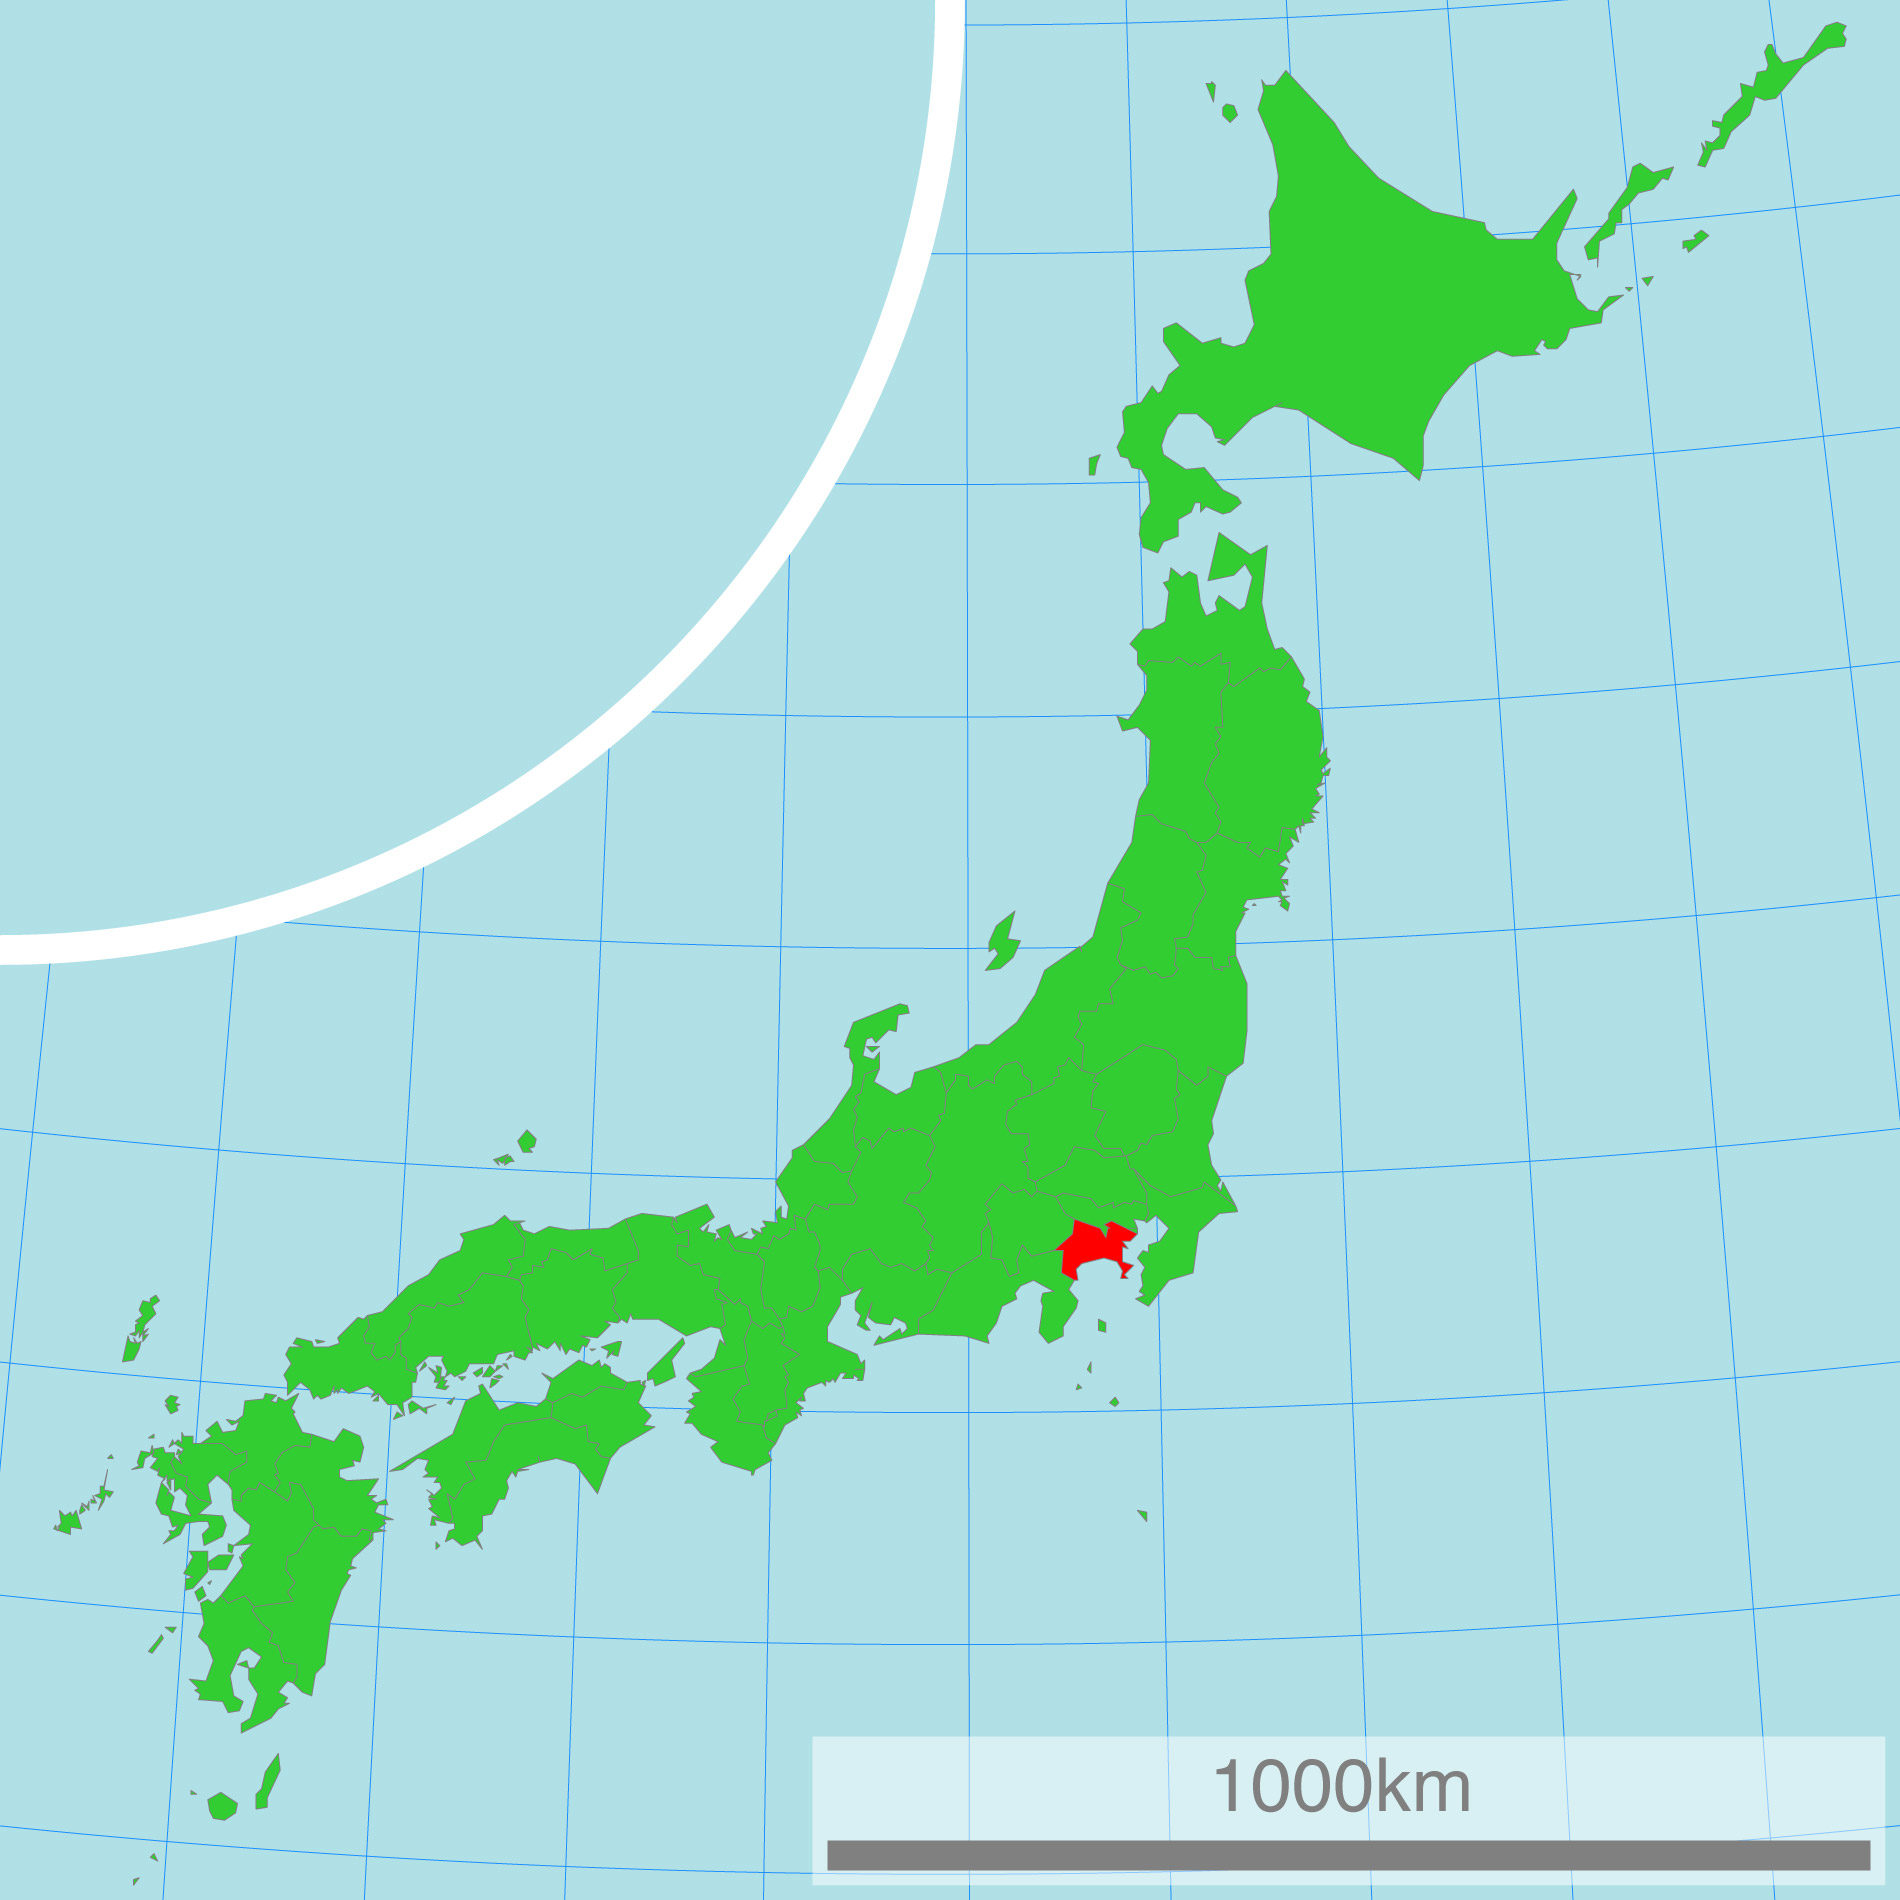 Japankarte: Die Präfektur Kanagawa.